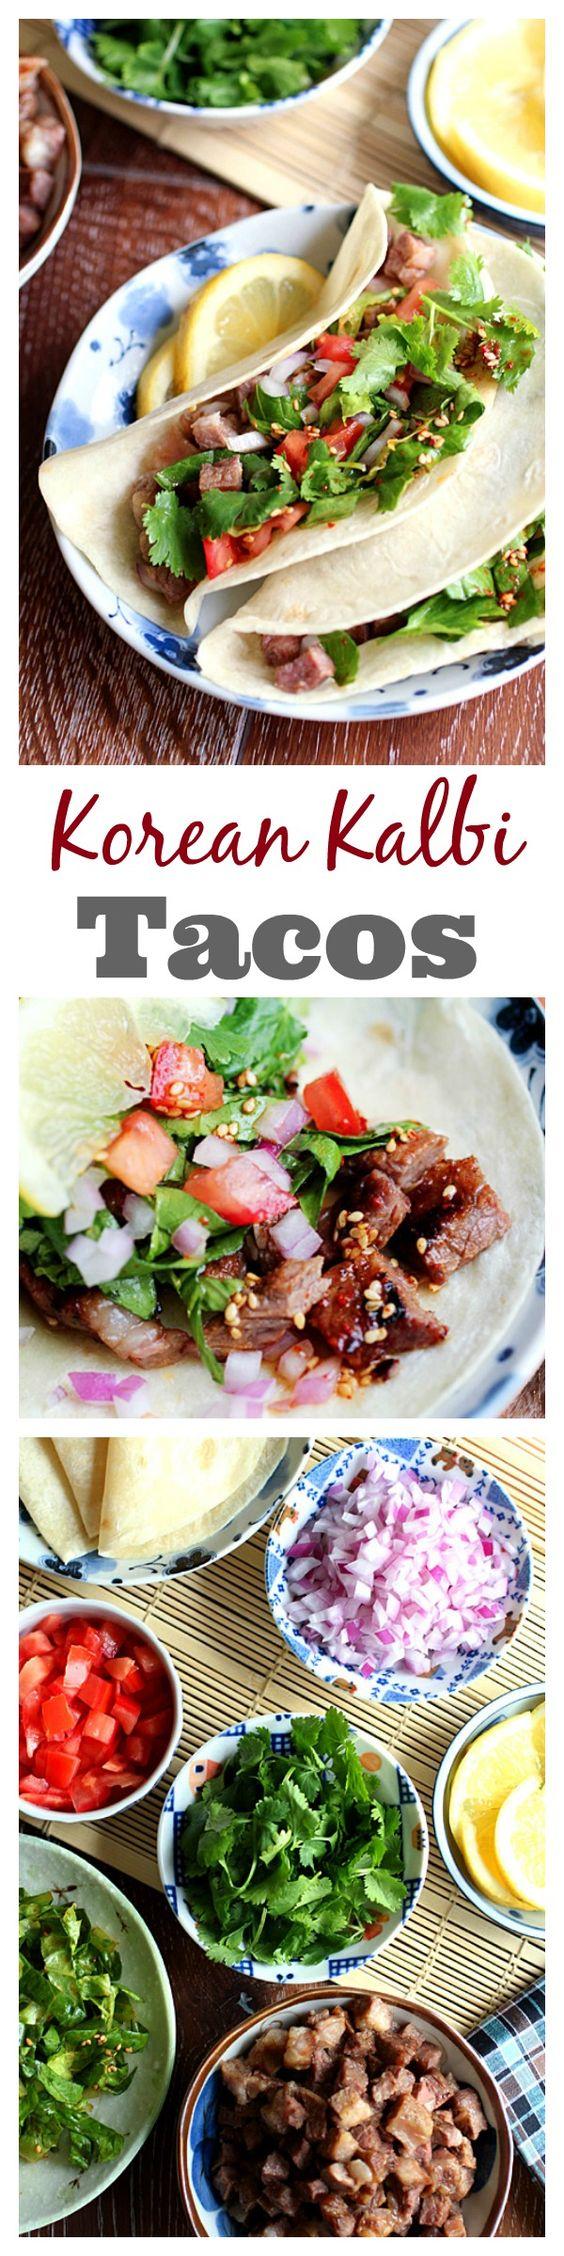 ... beef short ribs short ribs ribs tacos beef shorts korean tacos